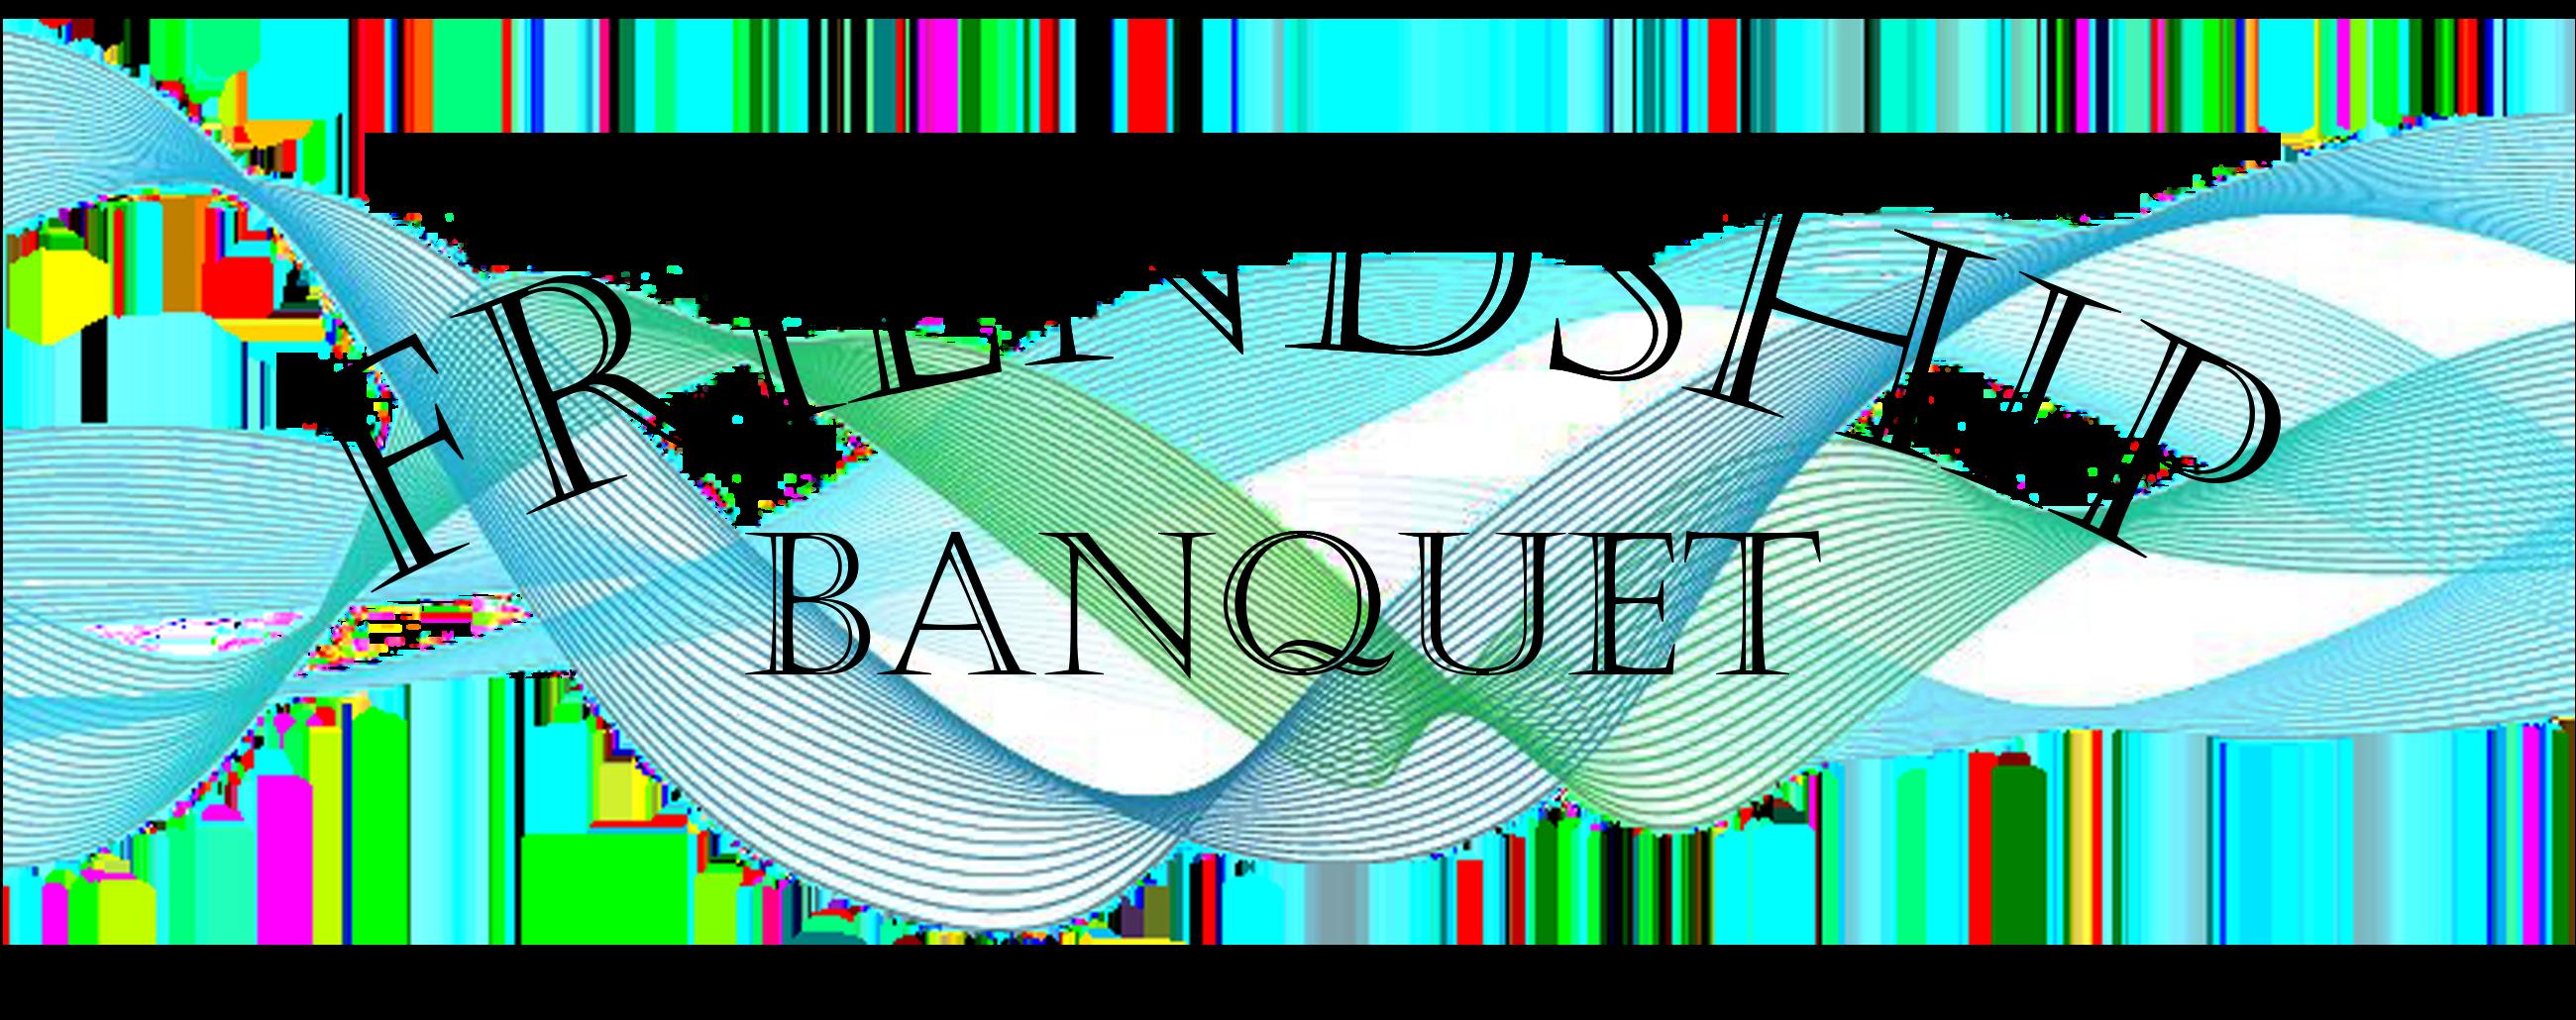 Missions clipart discipleship. Friendship banquet nehemiah homes